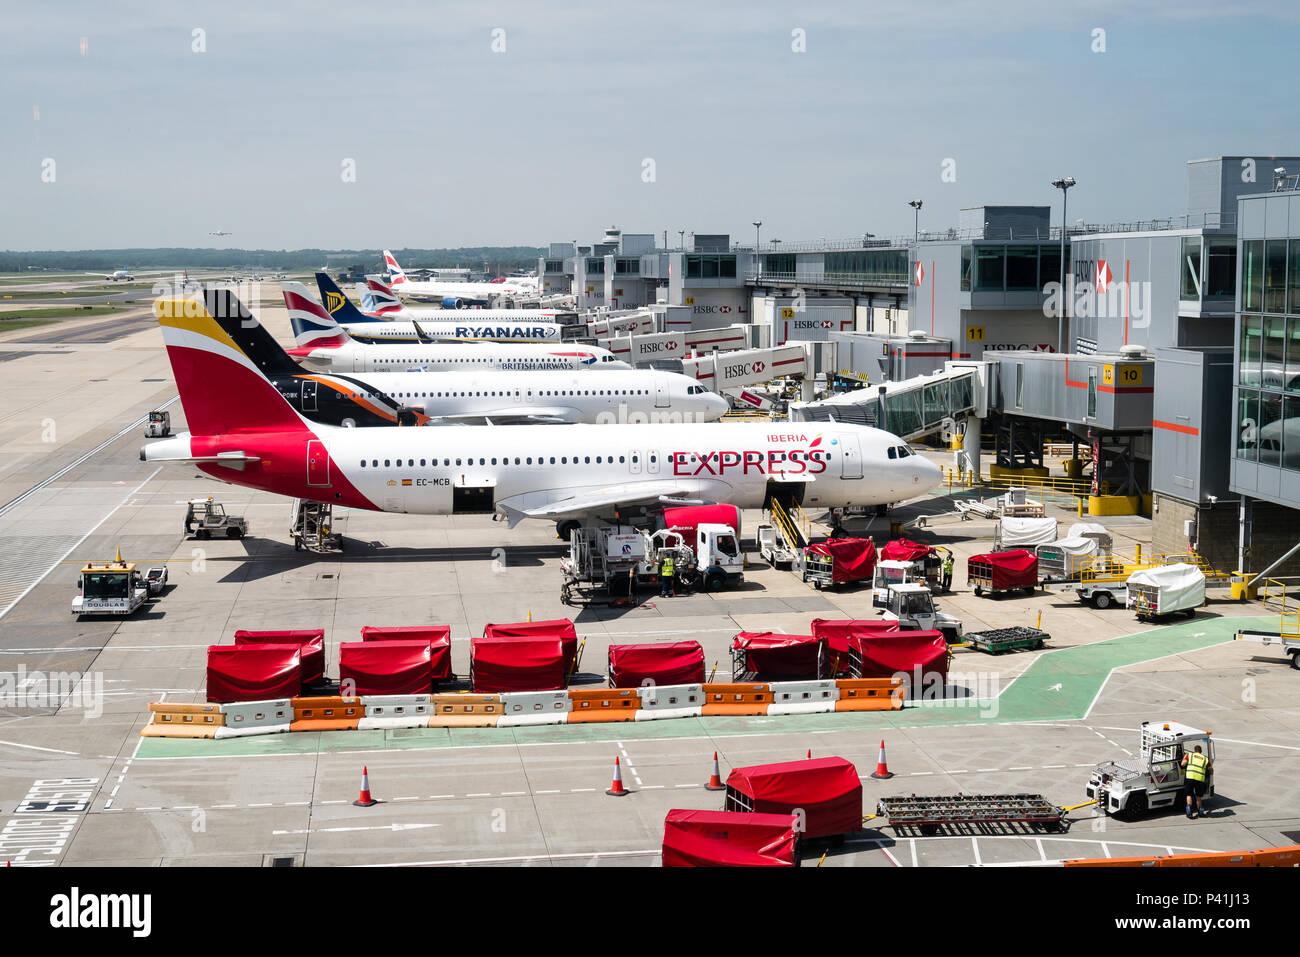 Aircraft at Gatwick Airport Stock Photo